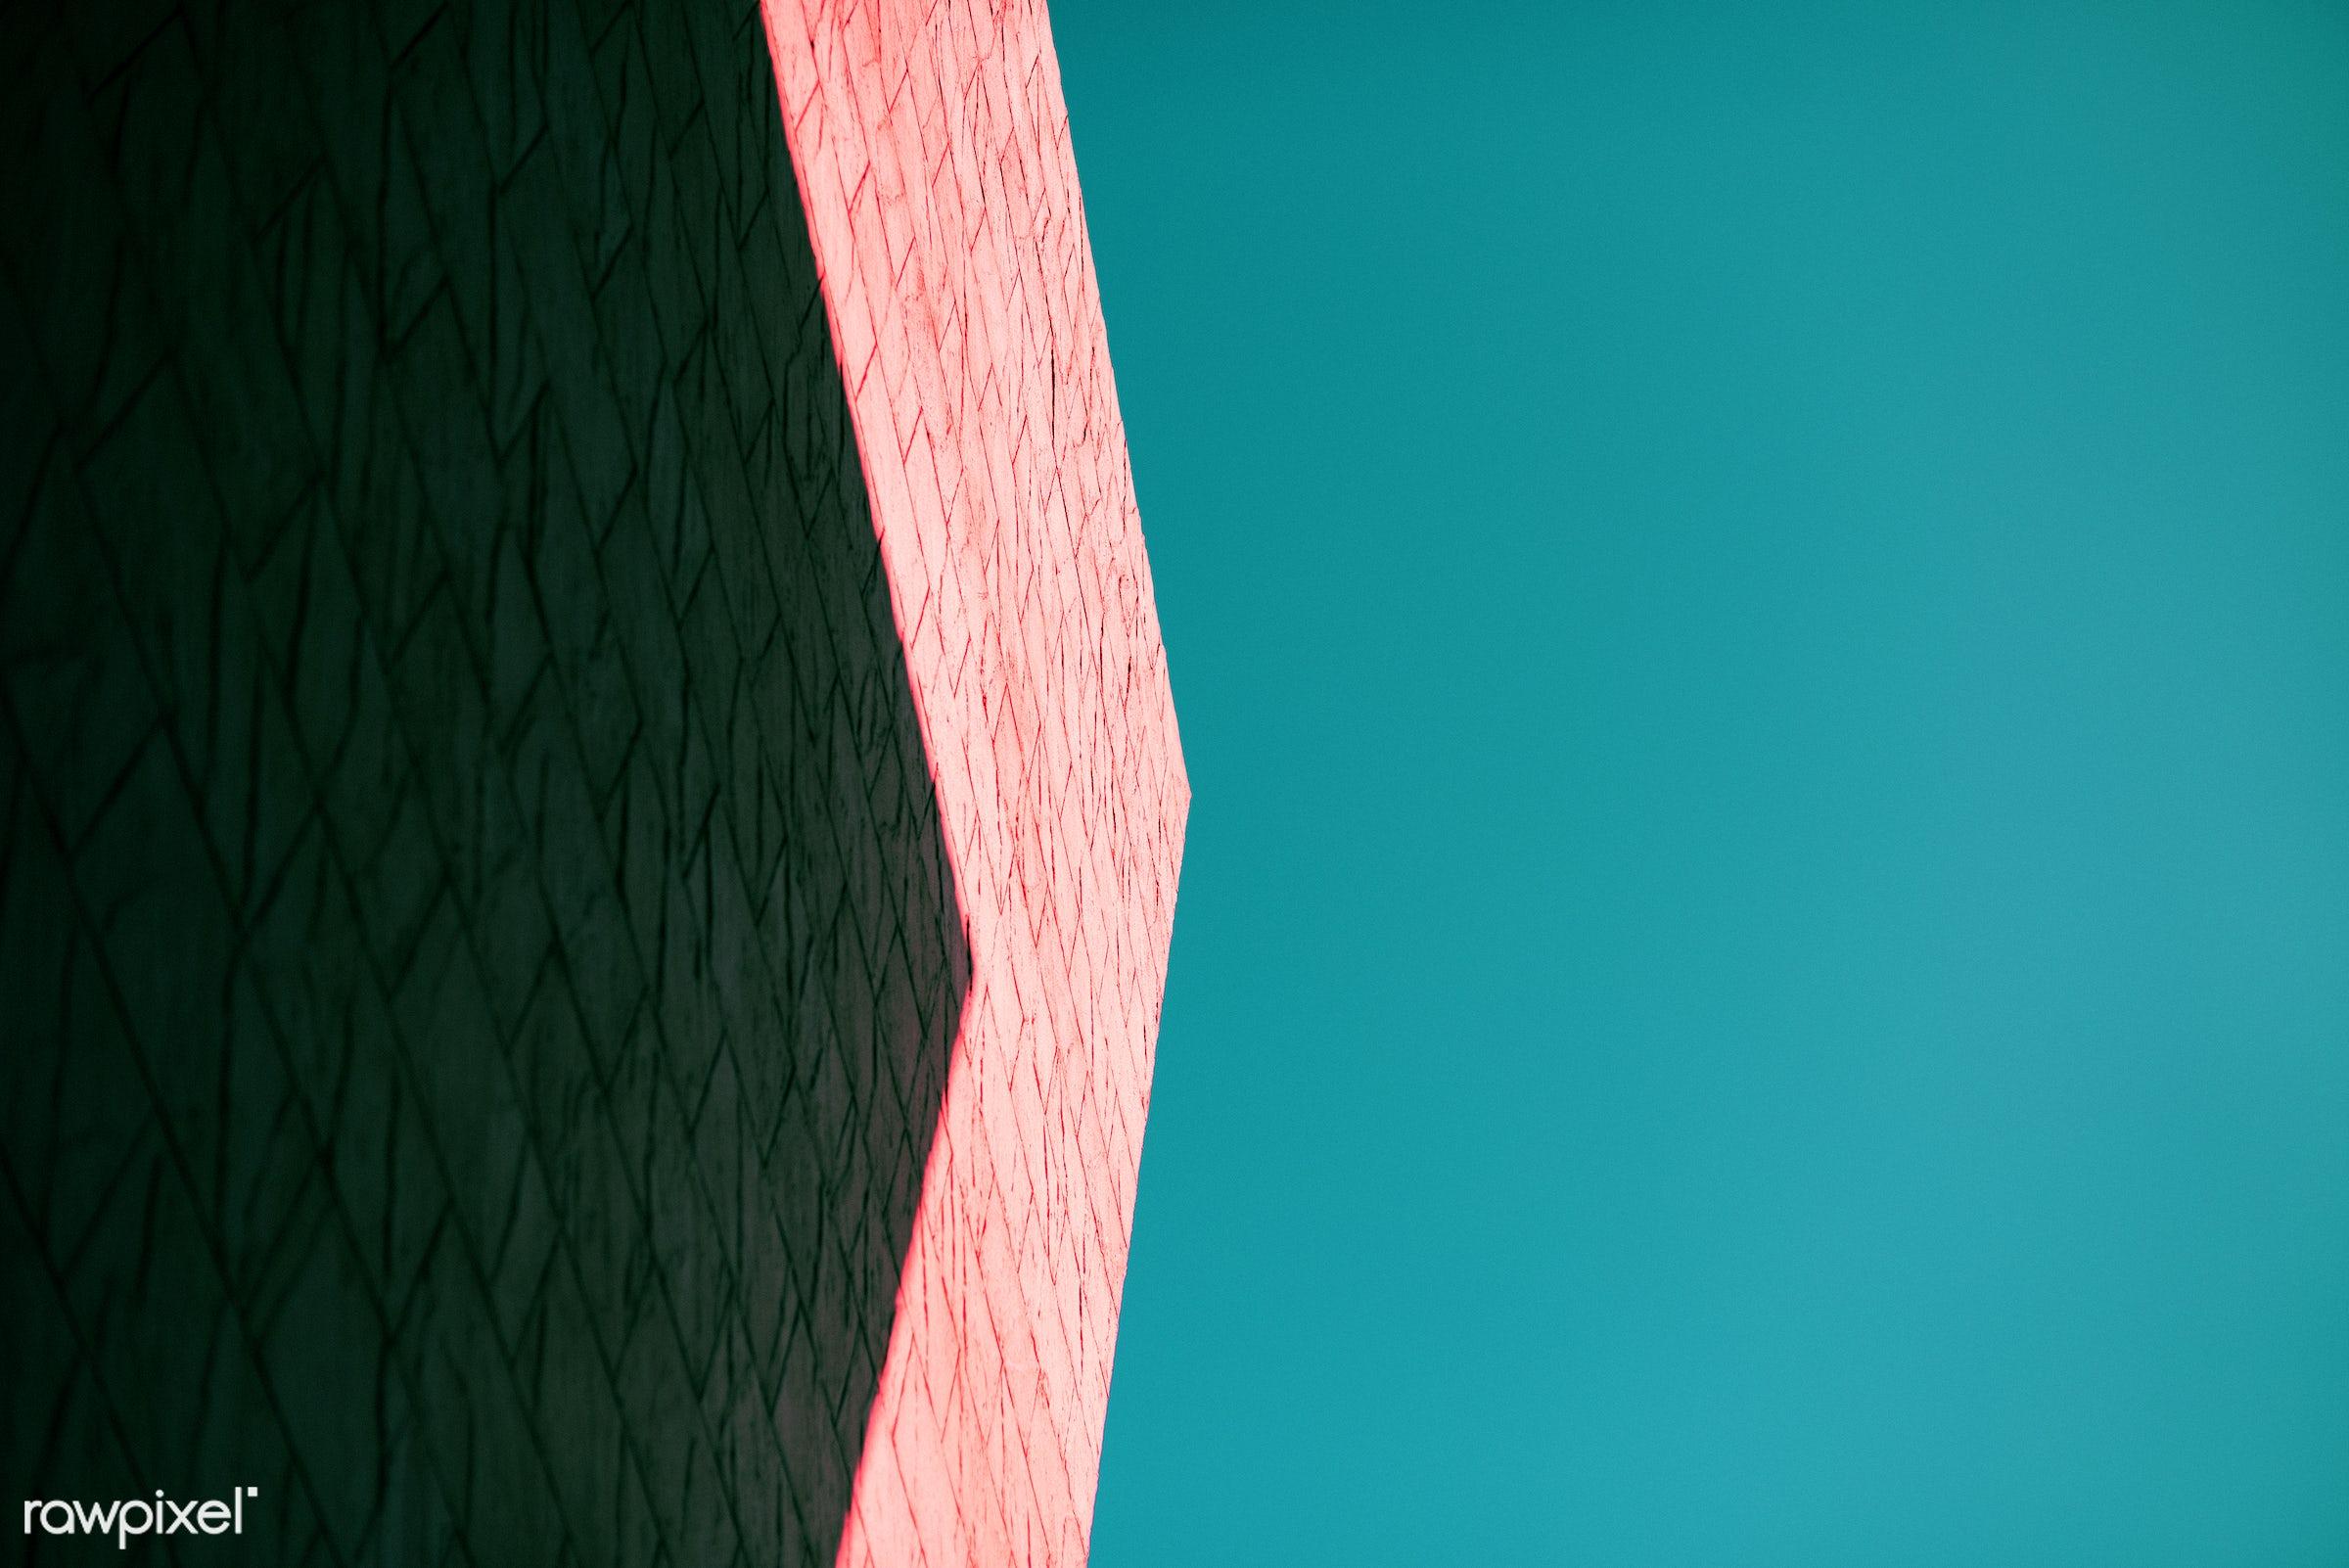 abstract, architecture, brick, building, concrete, construction, design, exterior, minimal, shadow, simple, simplicity, sky...